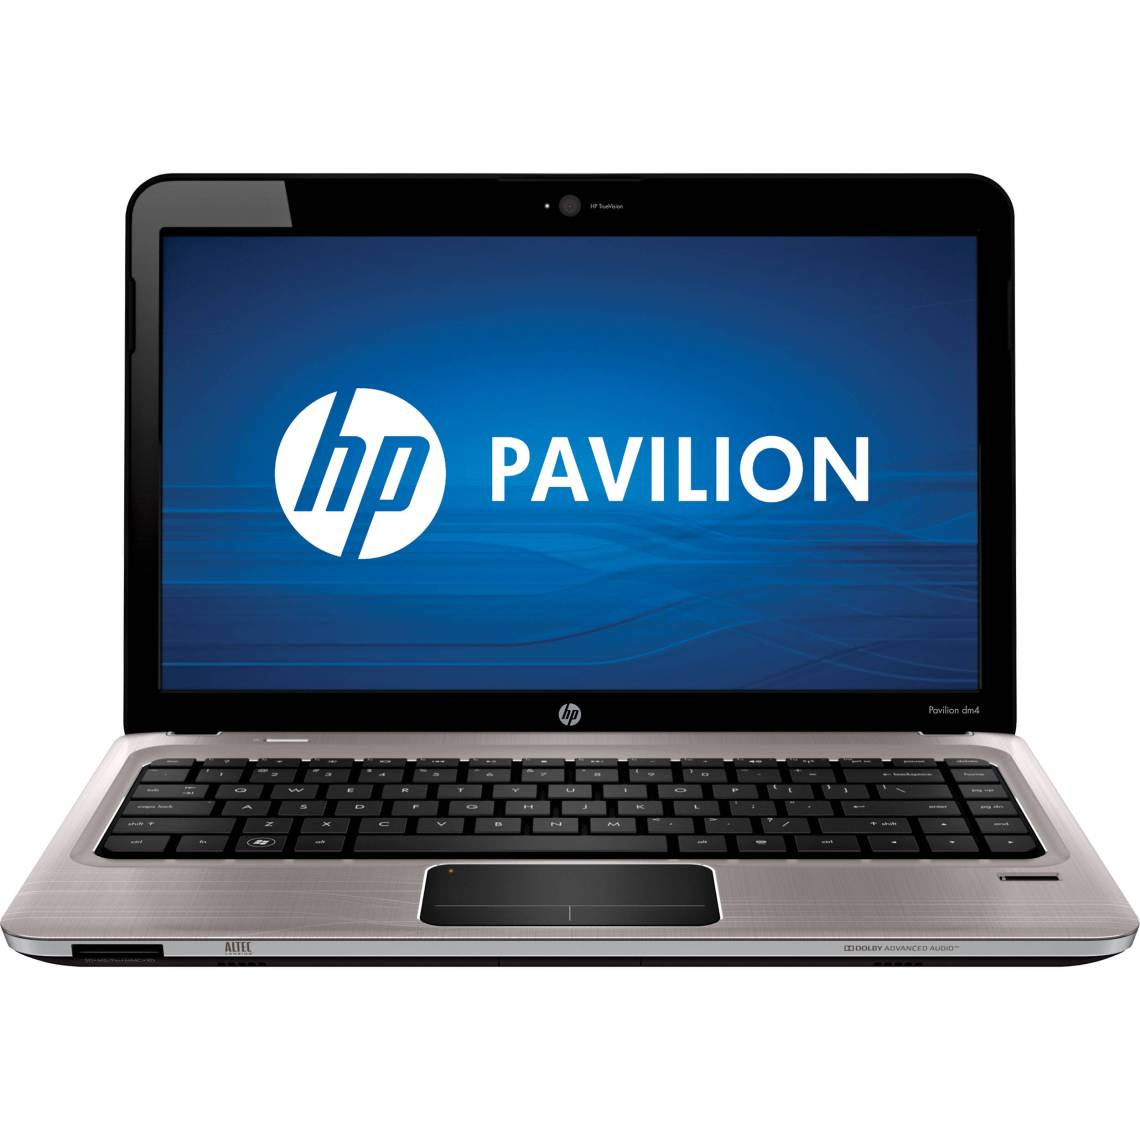 Hp Pavilion Dm Notebook Computer Steel Gray Brushed Aluminum